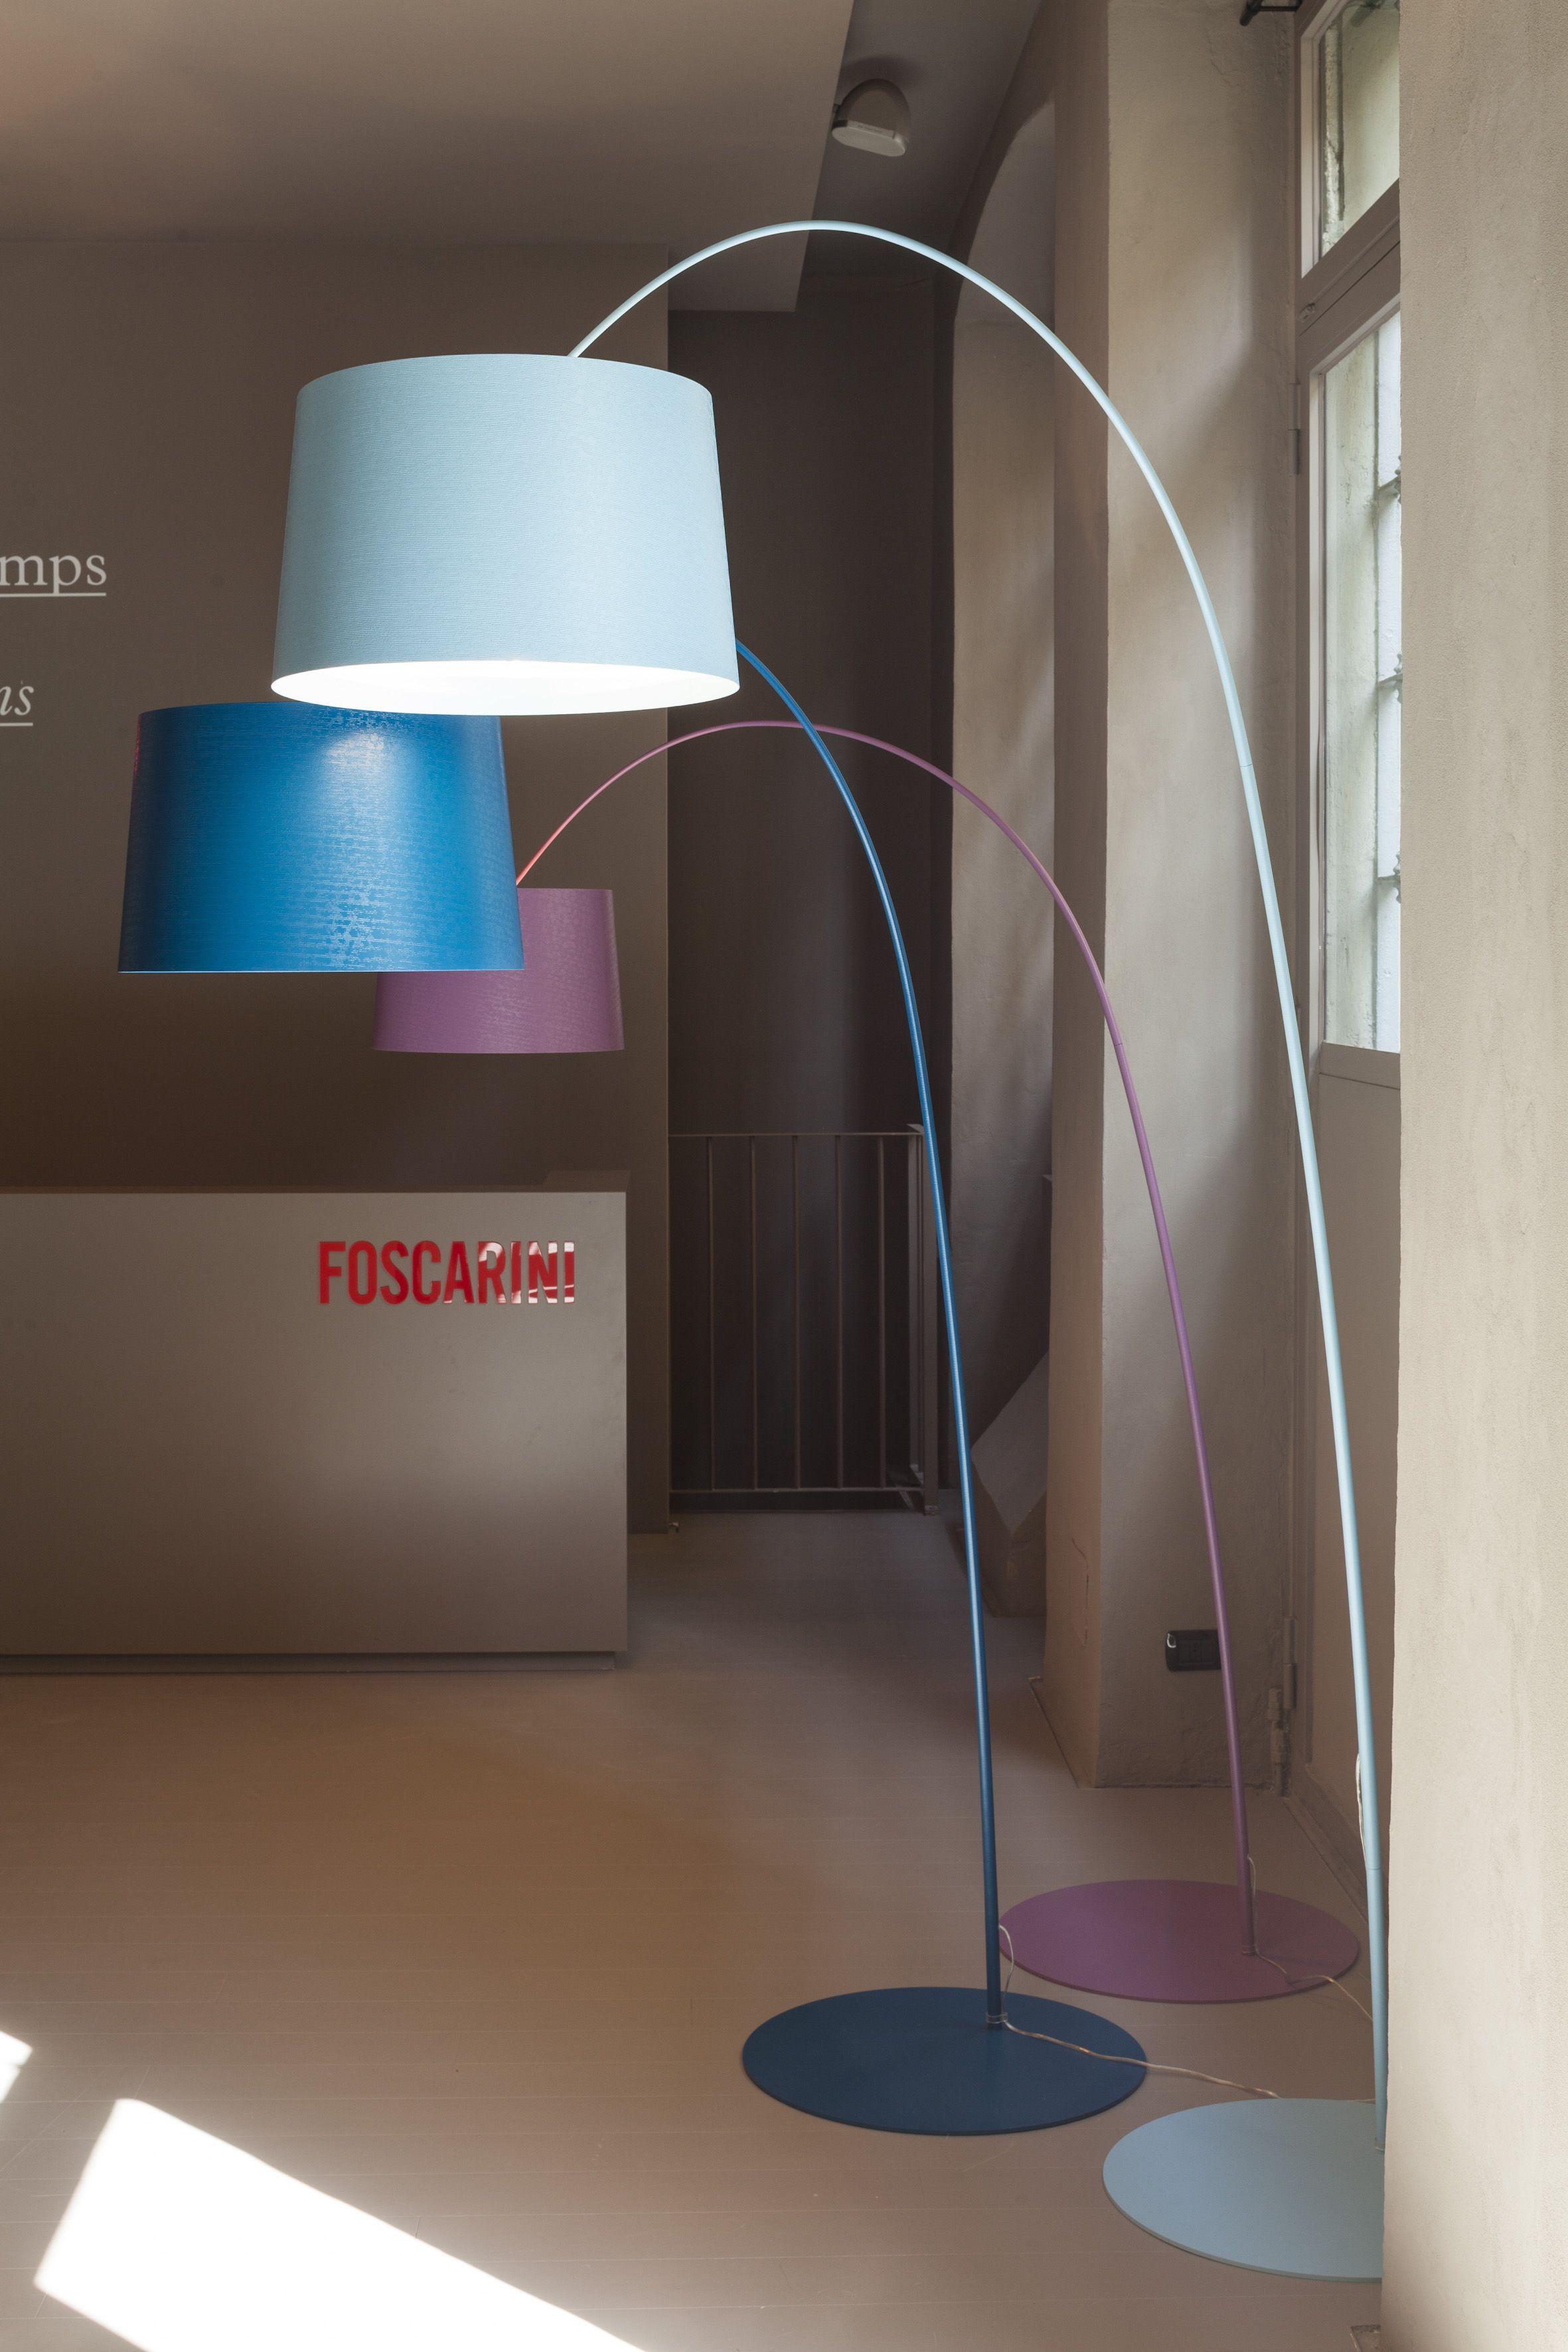 Foscarini Spazio Brera Present Twiggy Special Edition Milan 2013